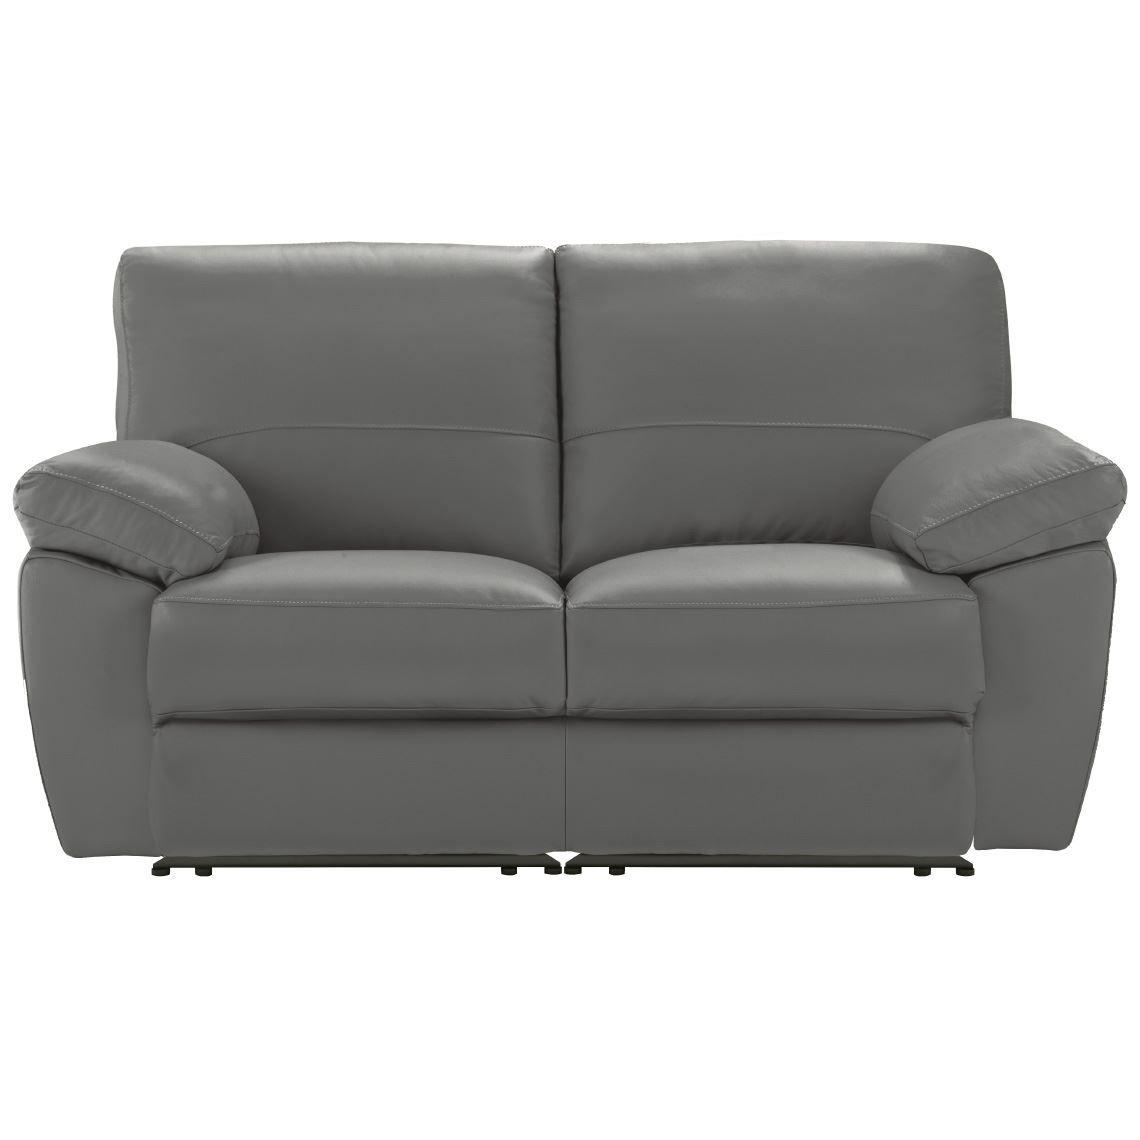 Lucas 2 Seat Leather Manual Recliner Sofa Reclining Sofa Leather Recliner Sofa